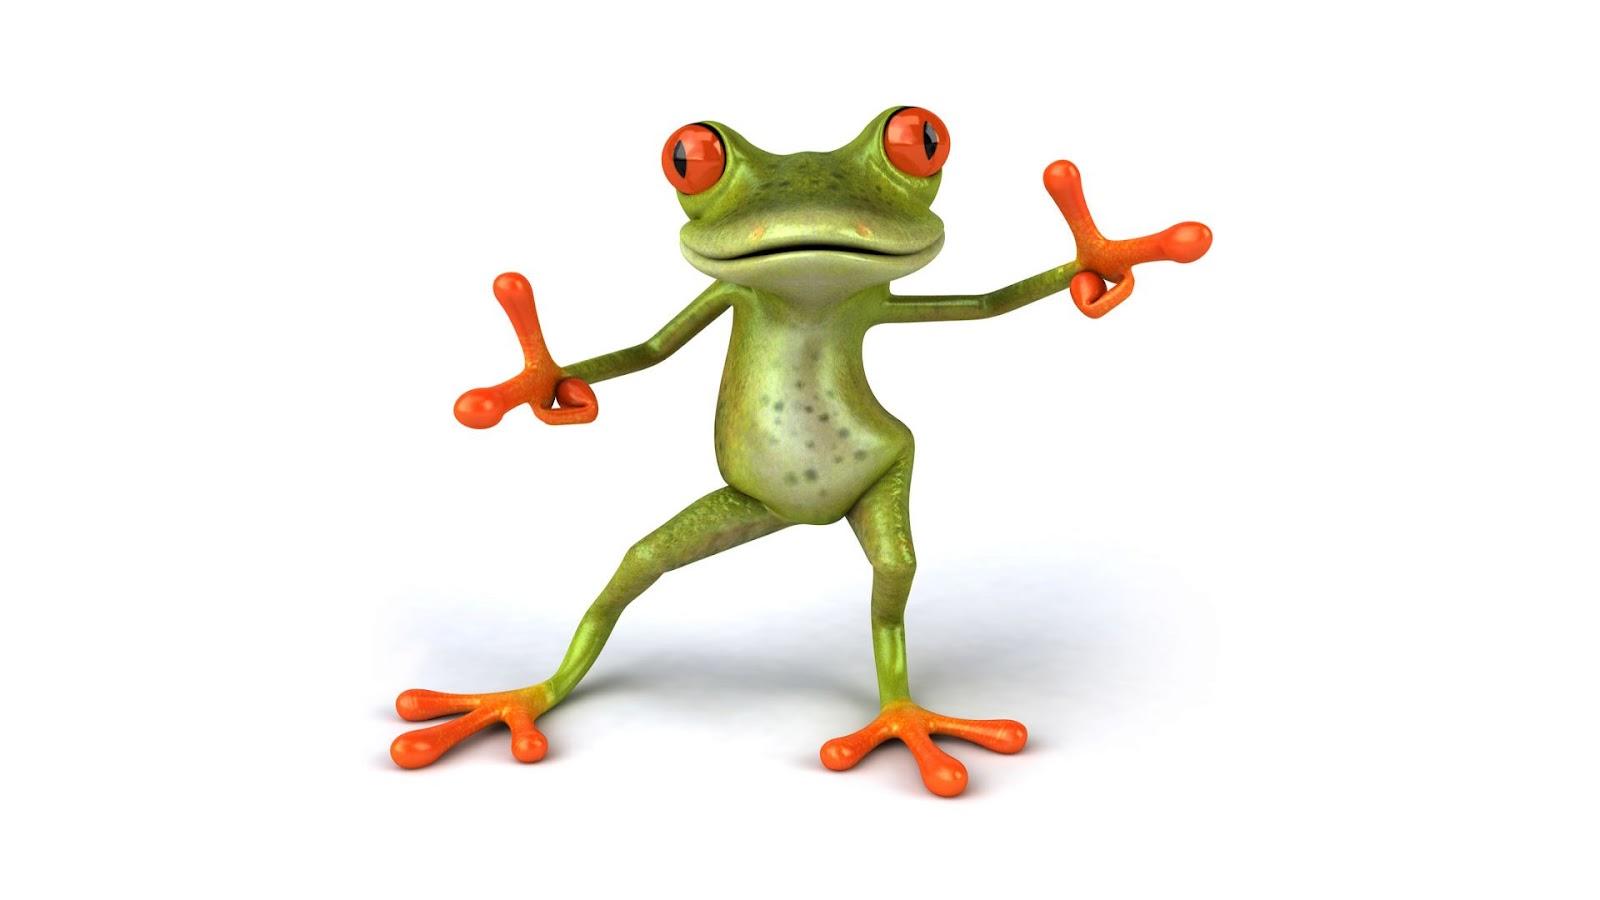 http://4.bp.blogspot.com/-BHuMSvPGcr0/T4vG-7Ap7hI/AAAAAAAADFM/h2lfGSqiYZo/s1600/Frog+3D+Wallpaper+4.jpg